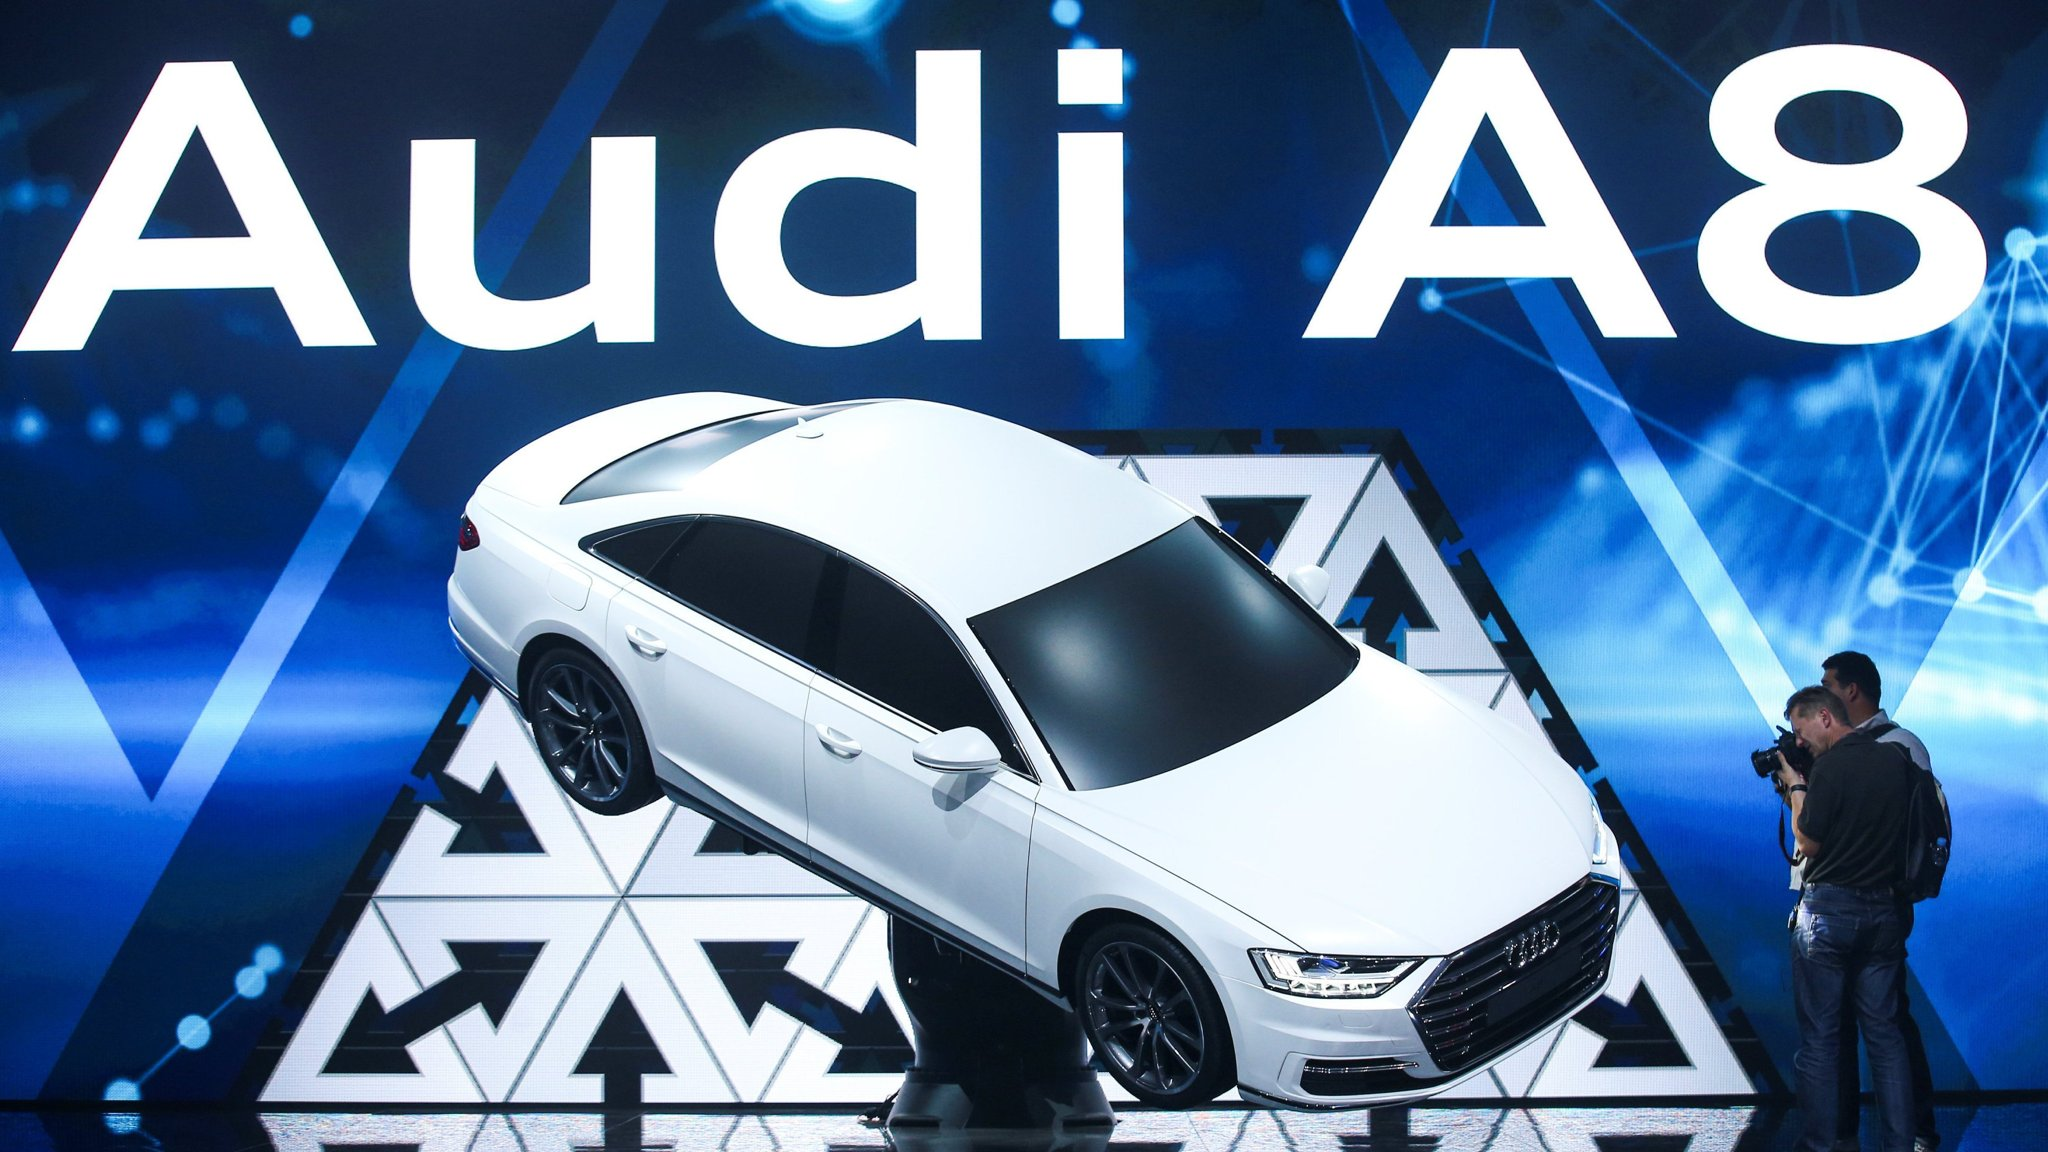 Audi Launches Most Advanced Selfdriving Car Financial Times - Audi driverless car